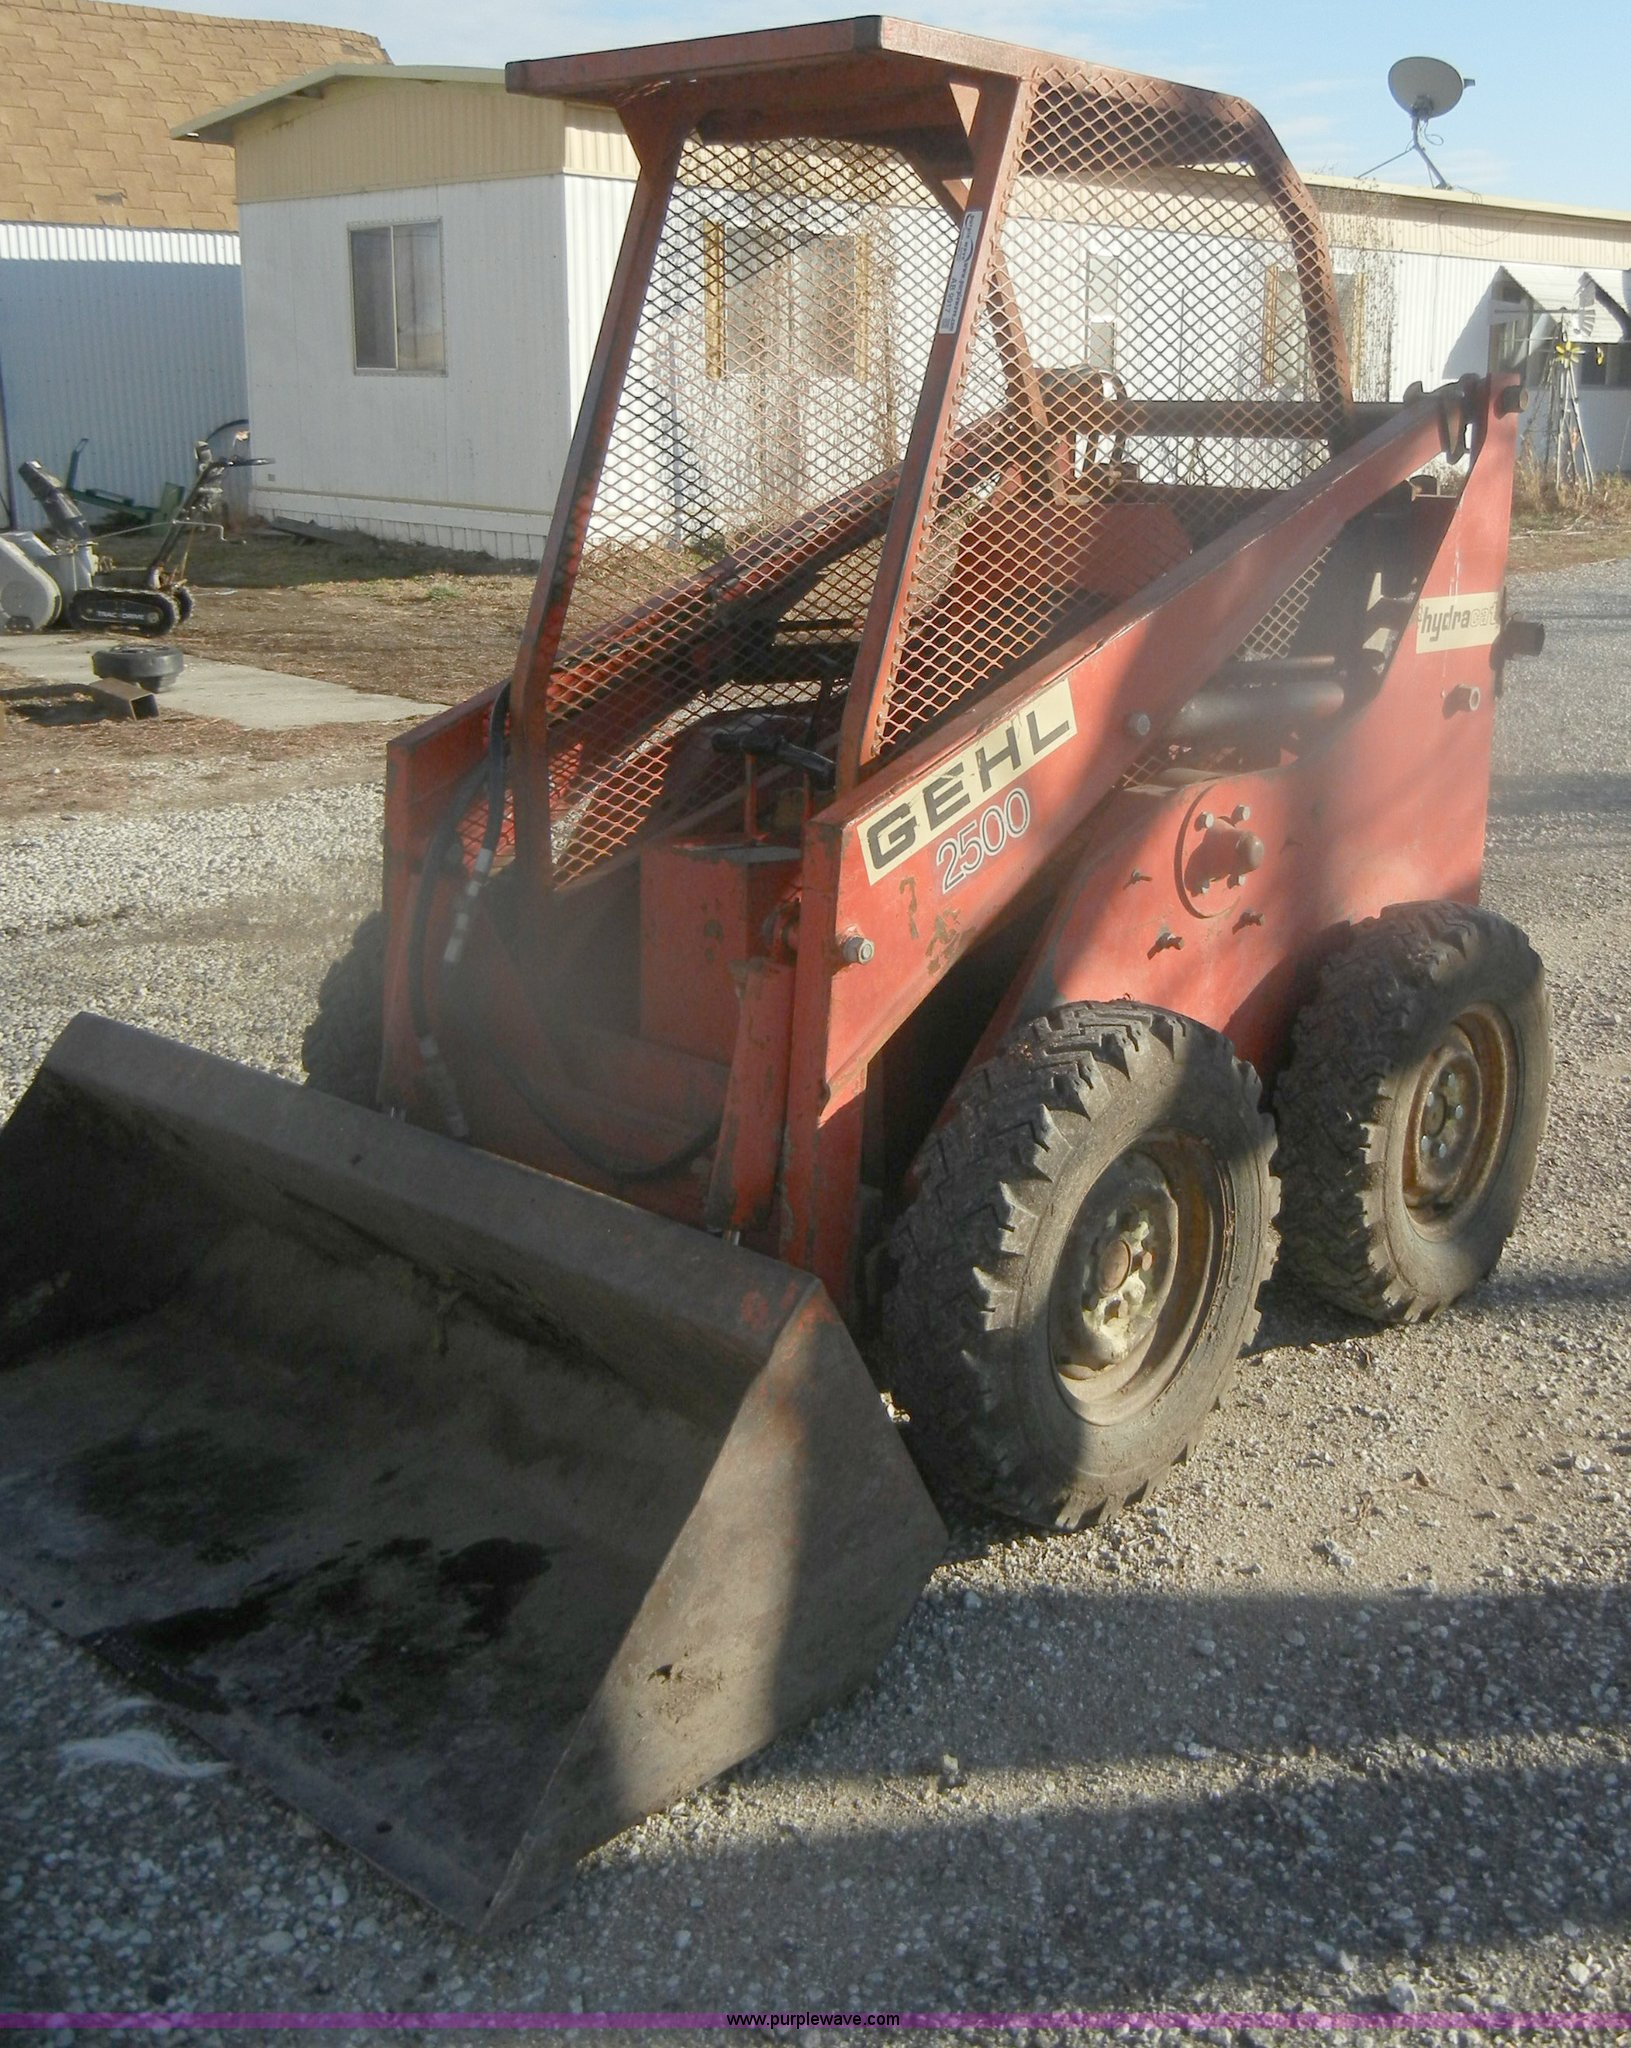 Gehl 2500 Hydro Cat skid steer | Item AB9917 | SOLD! Thursda